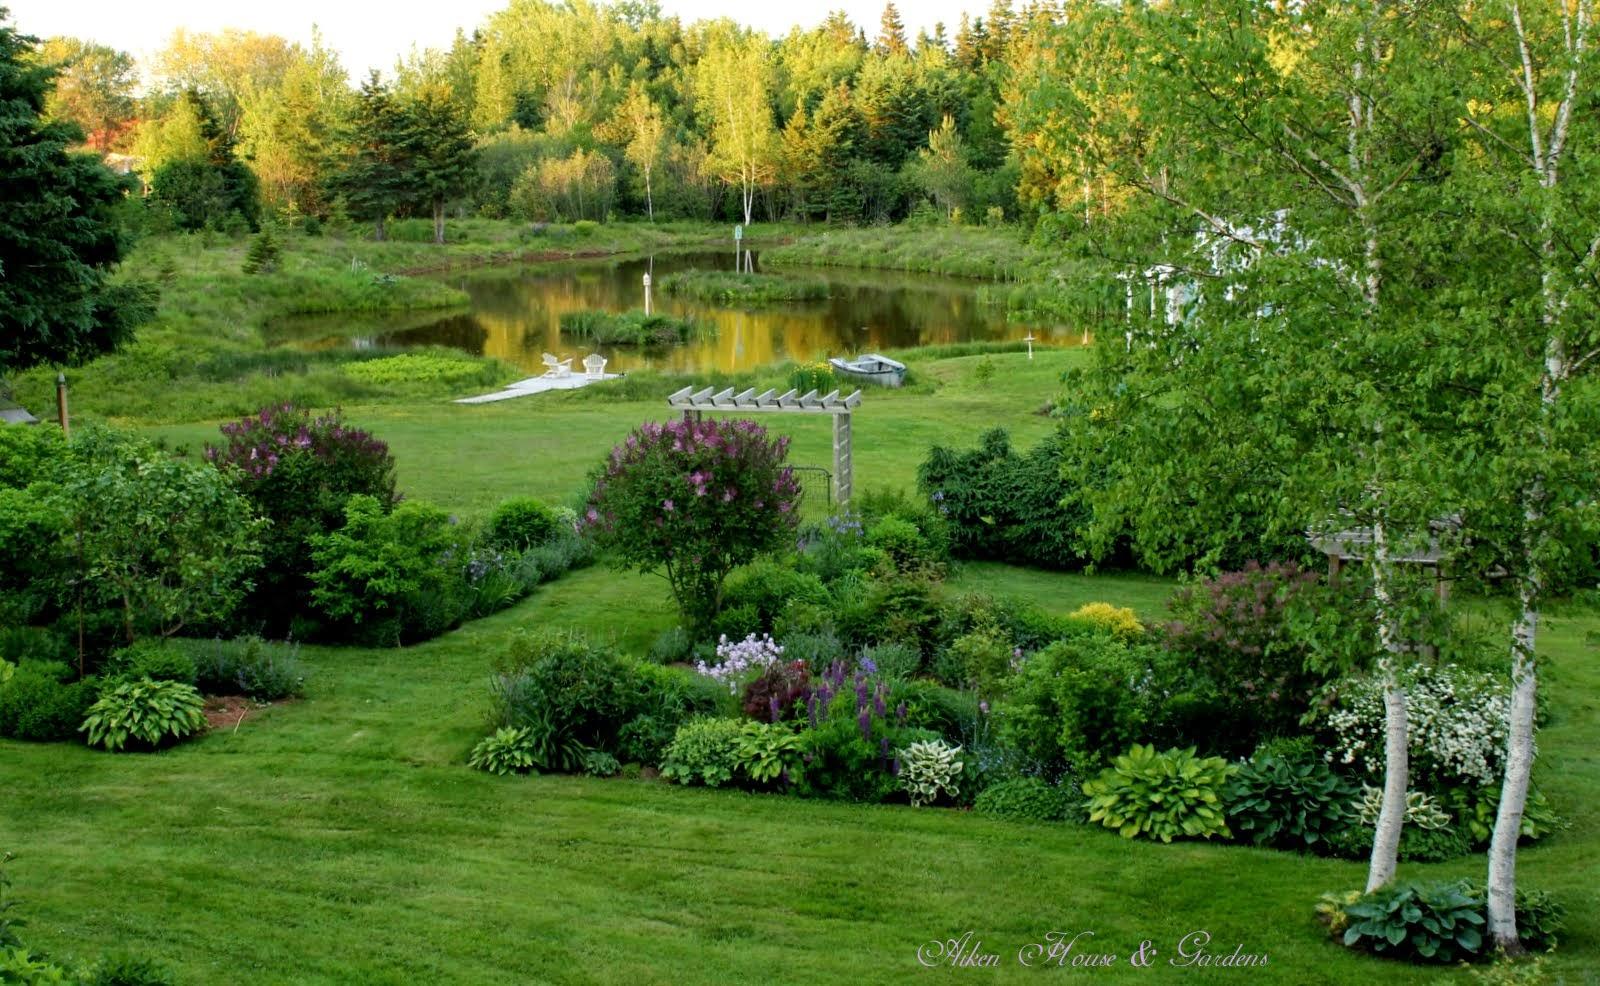 Aiken house gardens in an english country garden for Aiken house